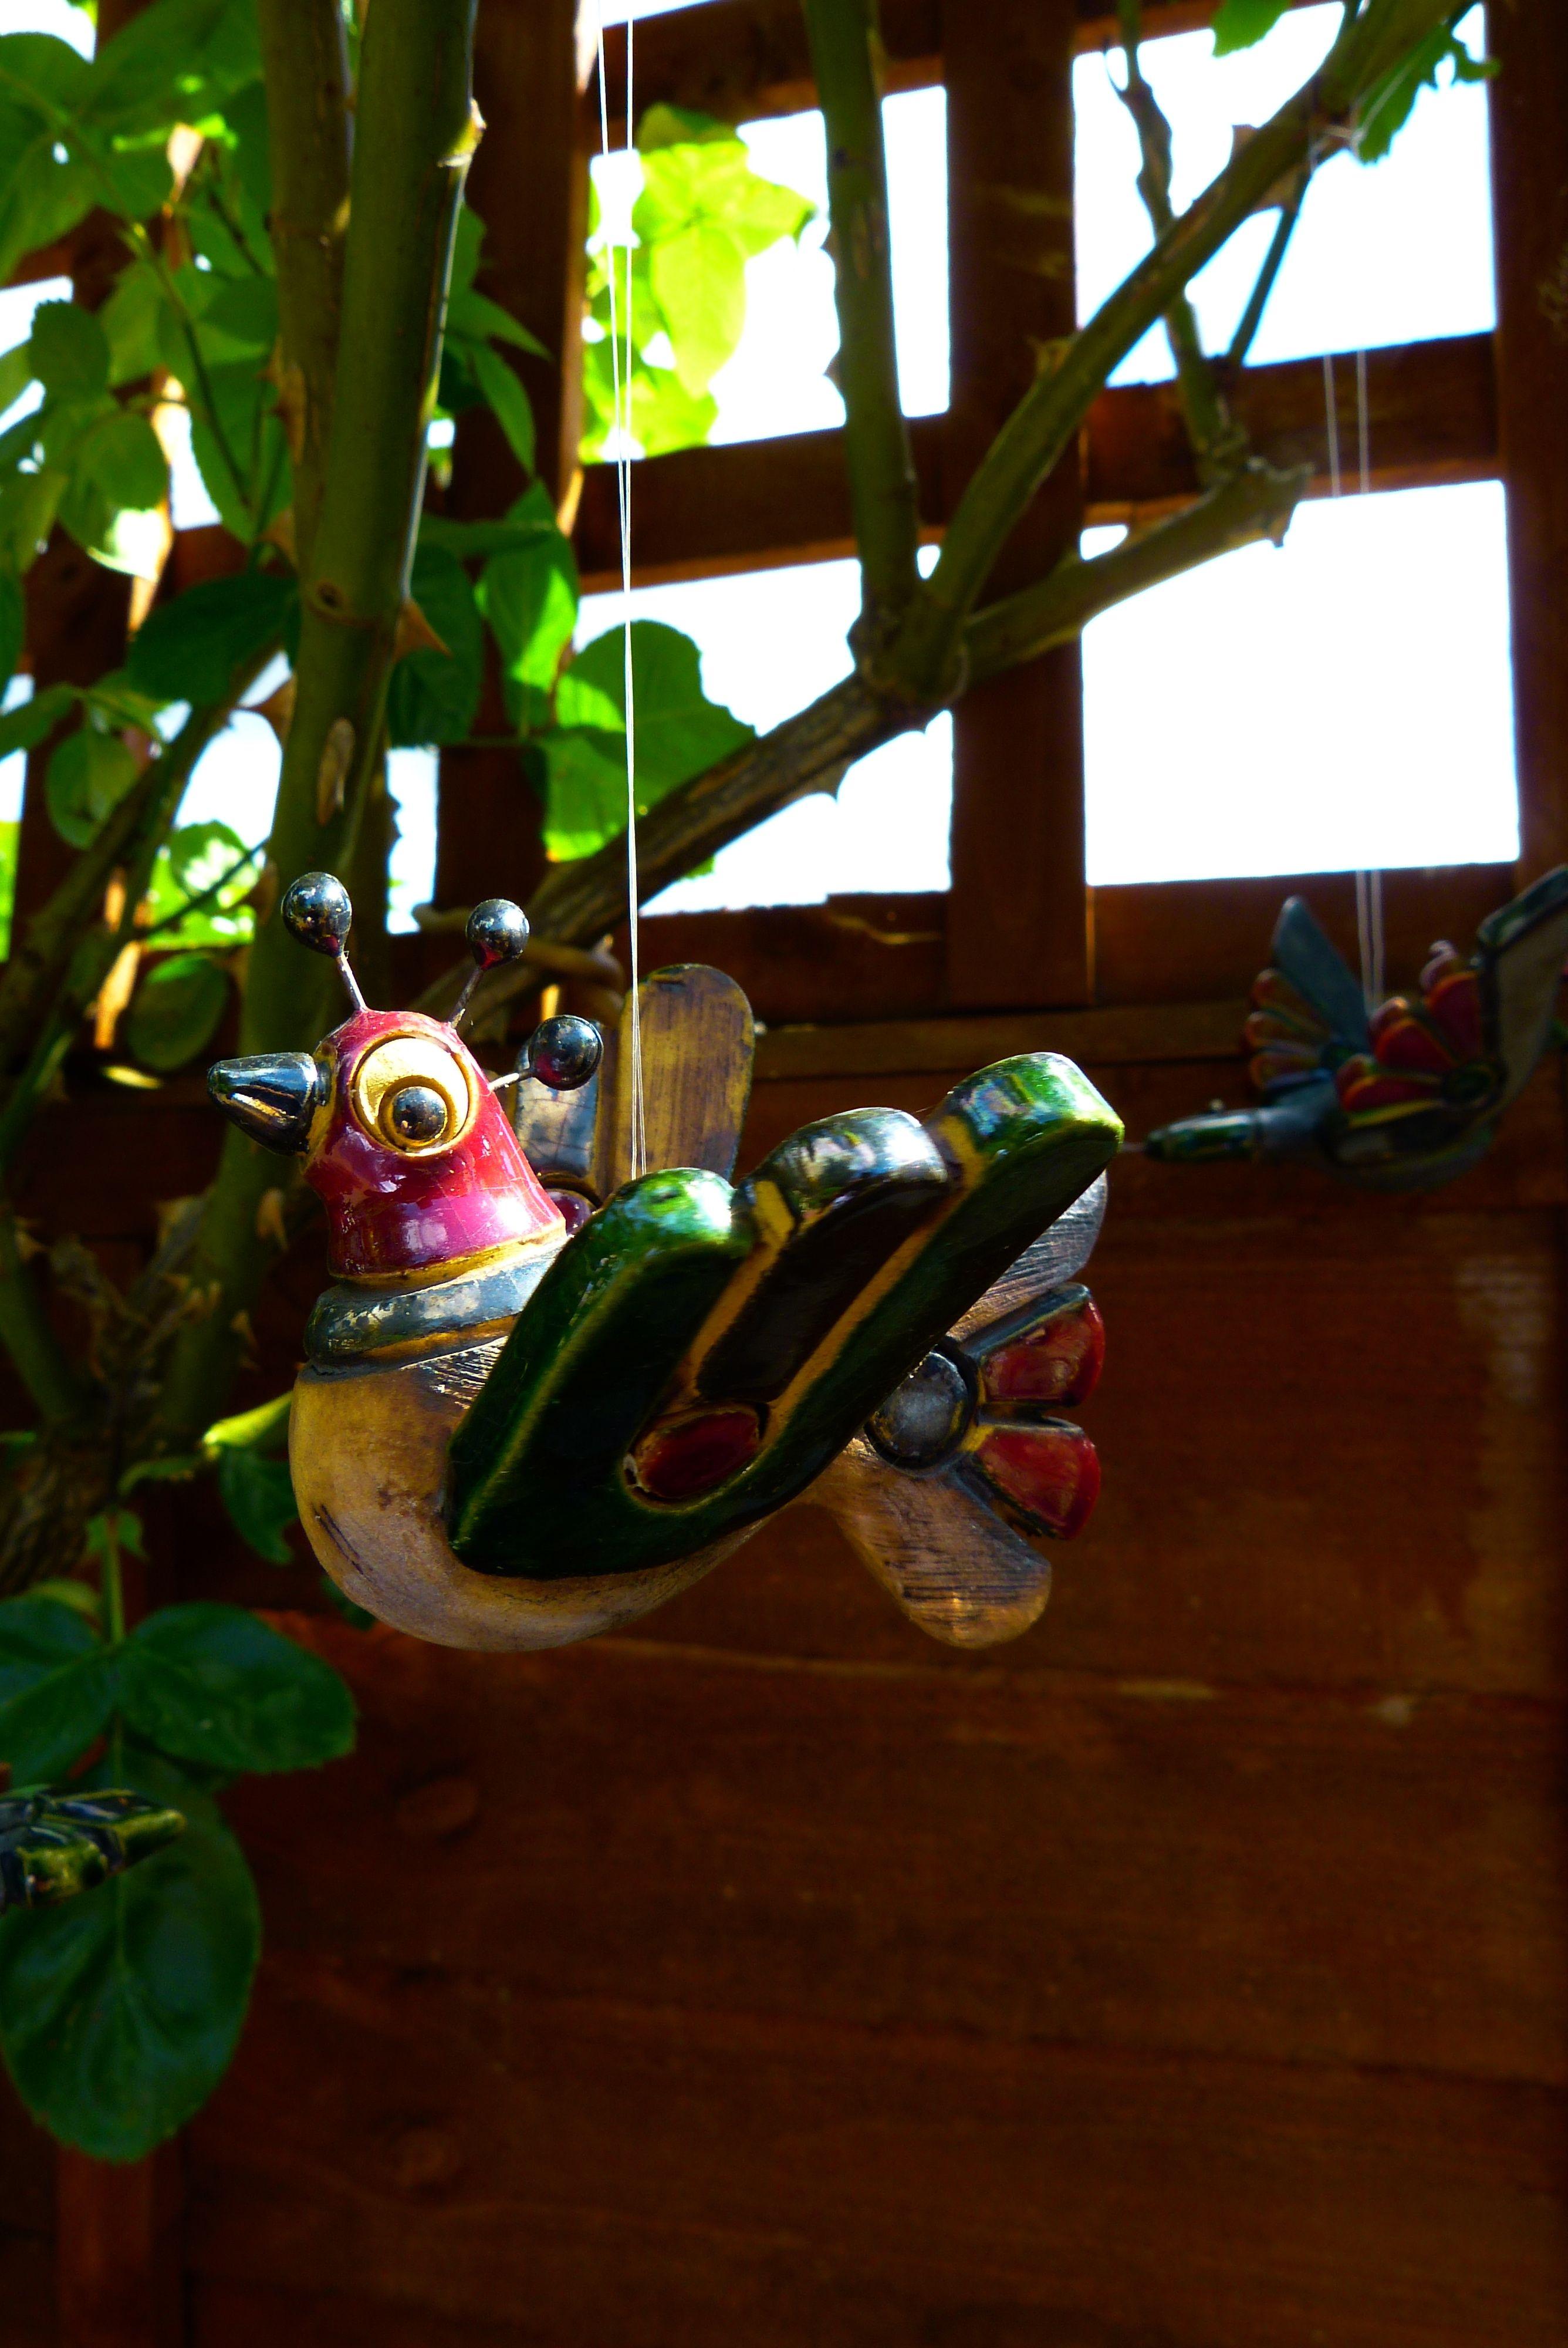 Window decor and more orange beach  bird ornament  my garden  pinterest  bird ornaments and gardens